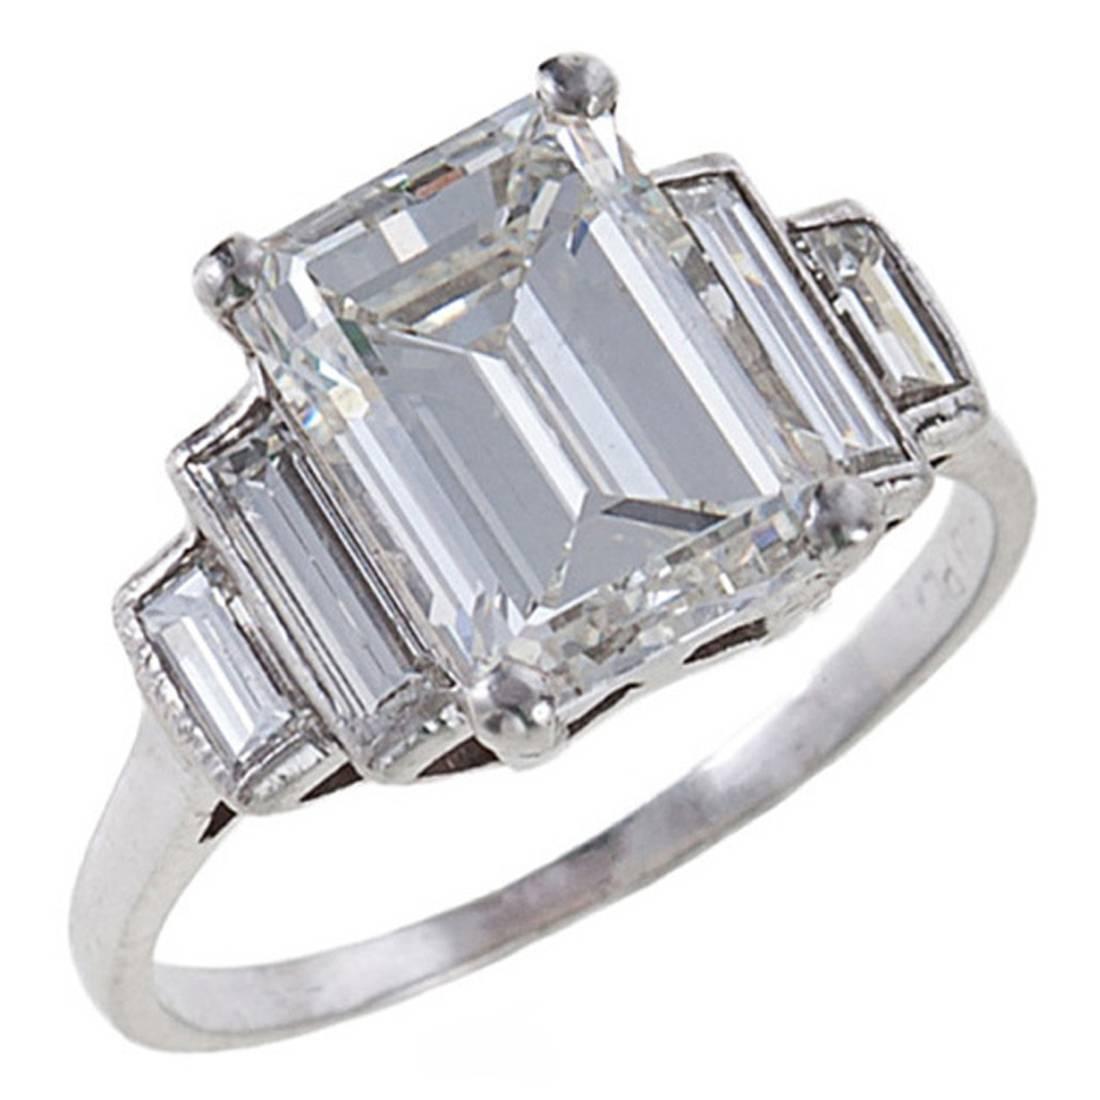 Fine 3 06 Carat Emerald Cut Diamond Platinum Ring at 1stdibs